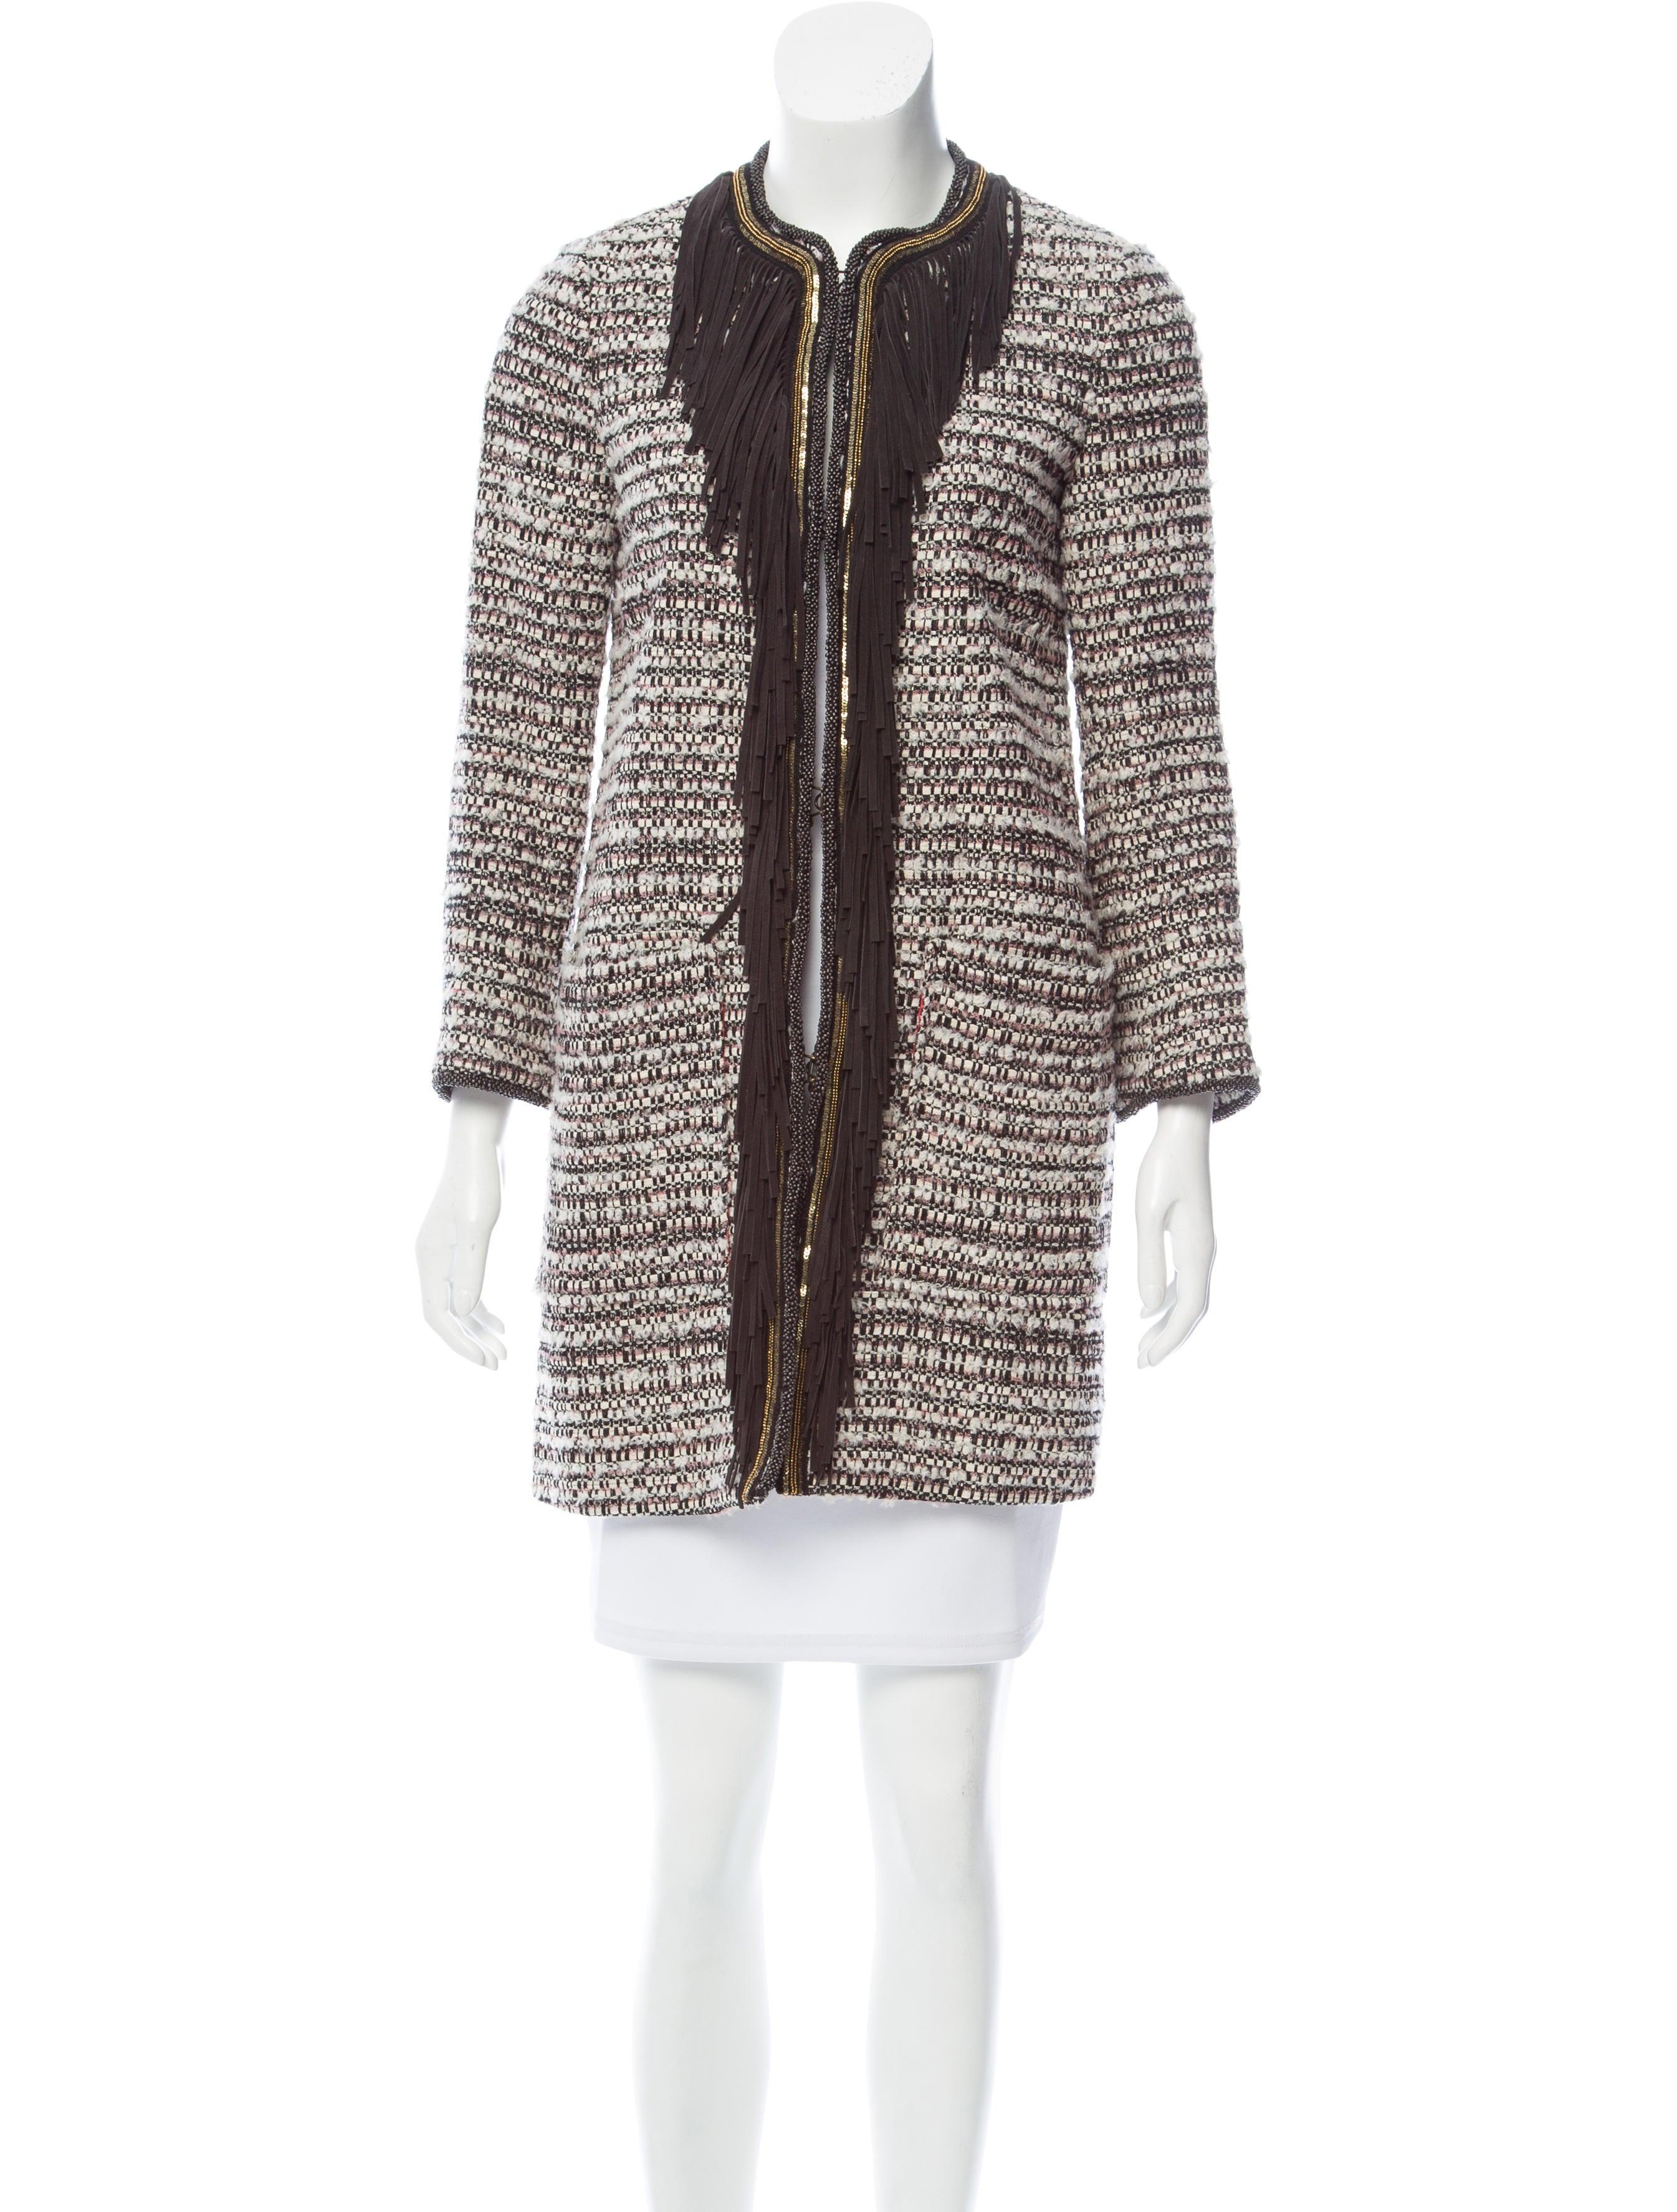 a4487540b0 Bazar Deluxe Fringe-Trimmed Tweed Coat - Clothing - WBZAR20010